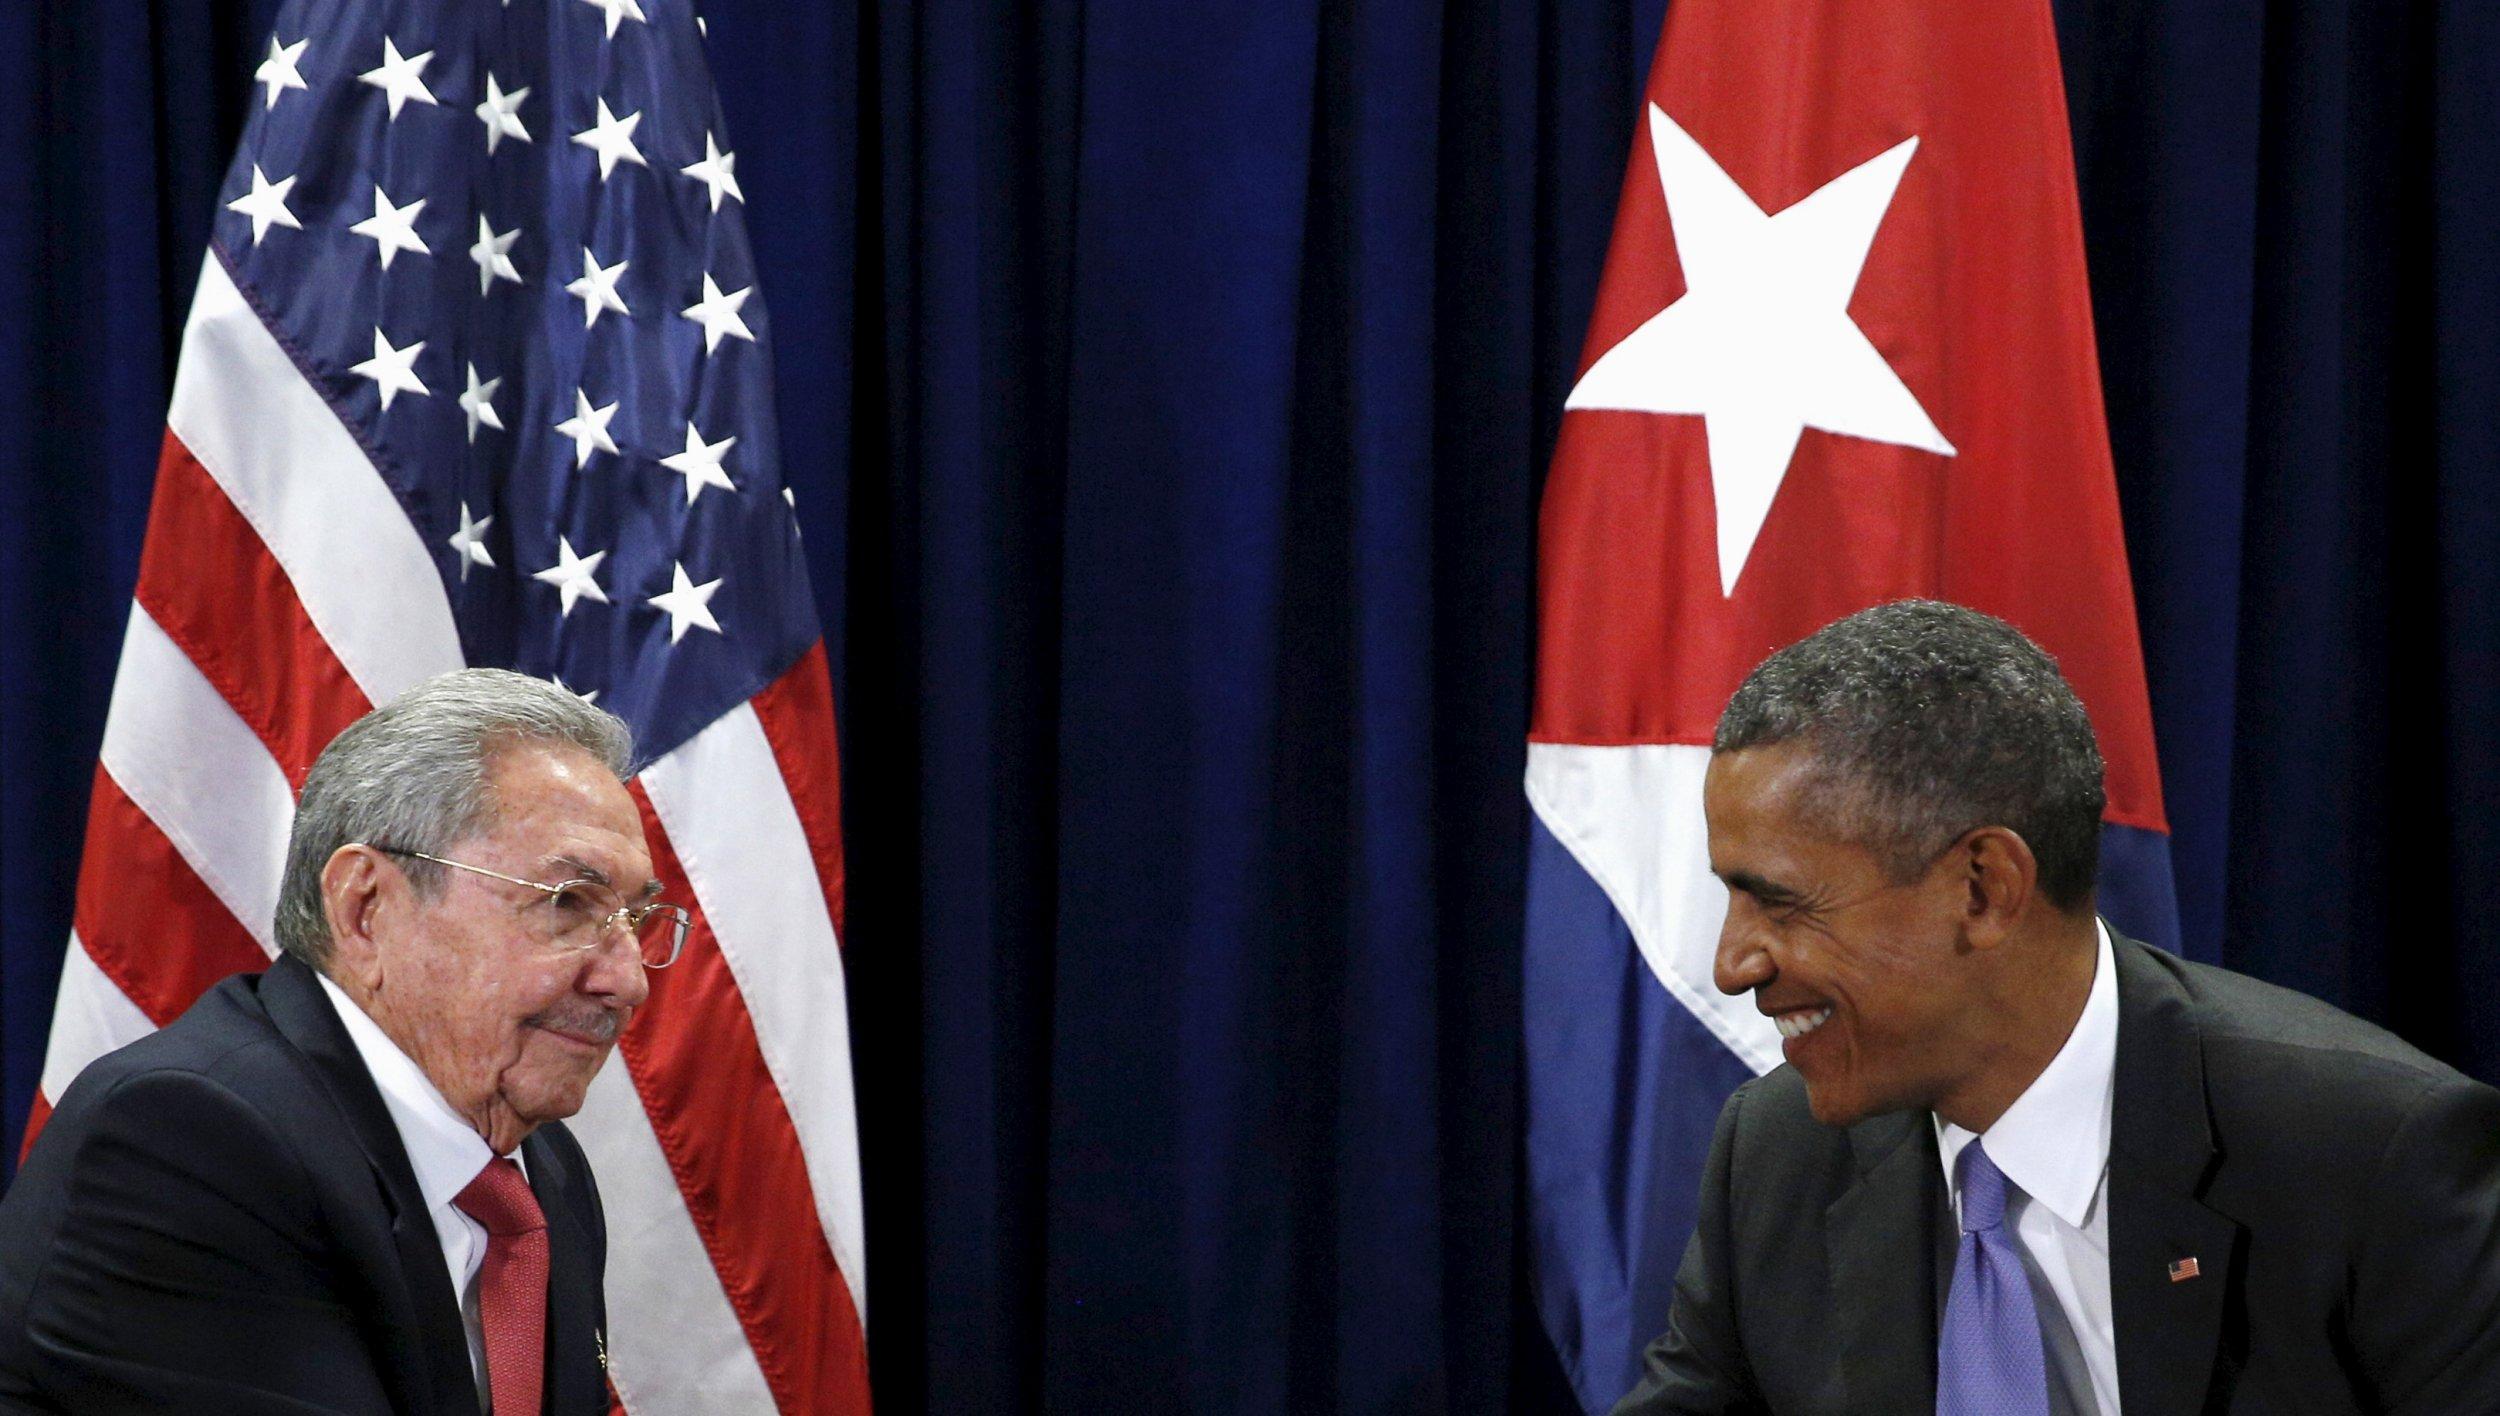 12_15_Obama_Cuba_01